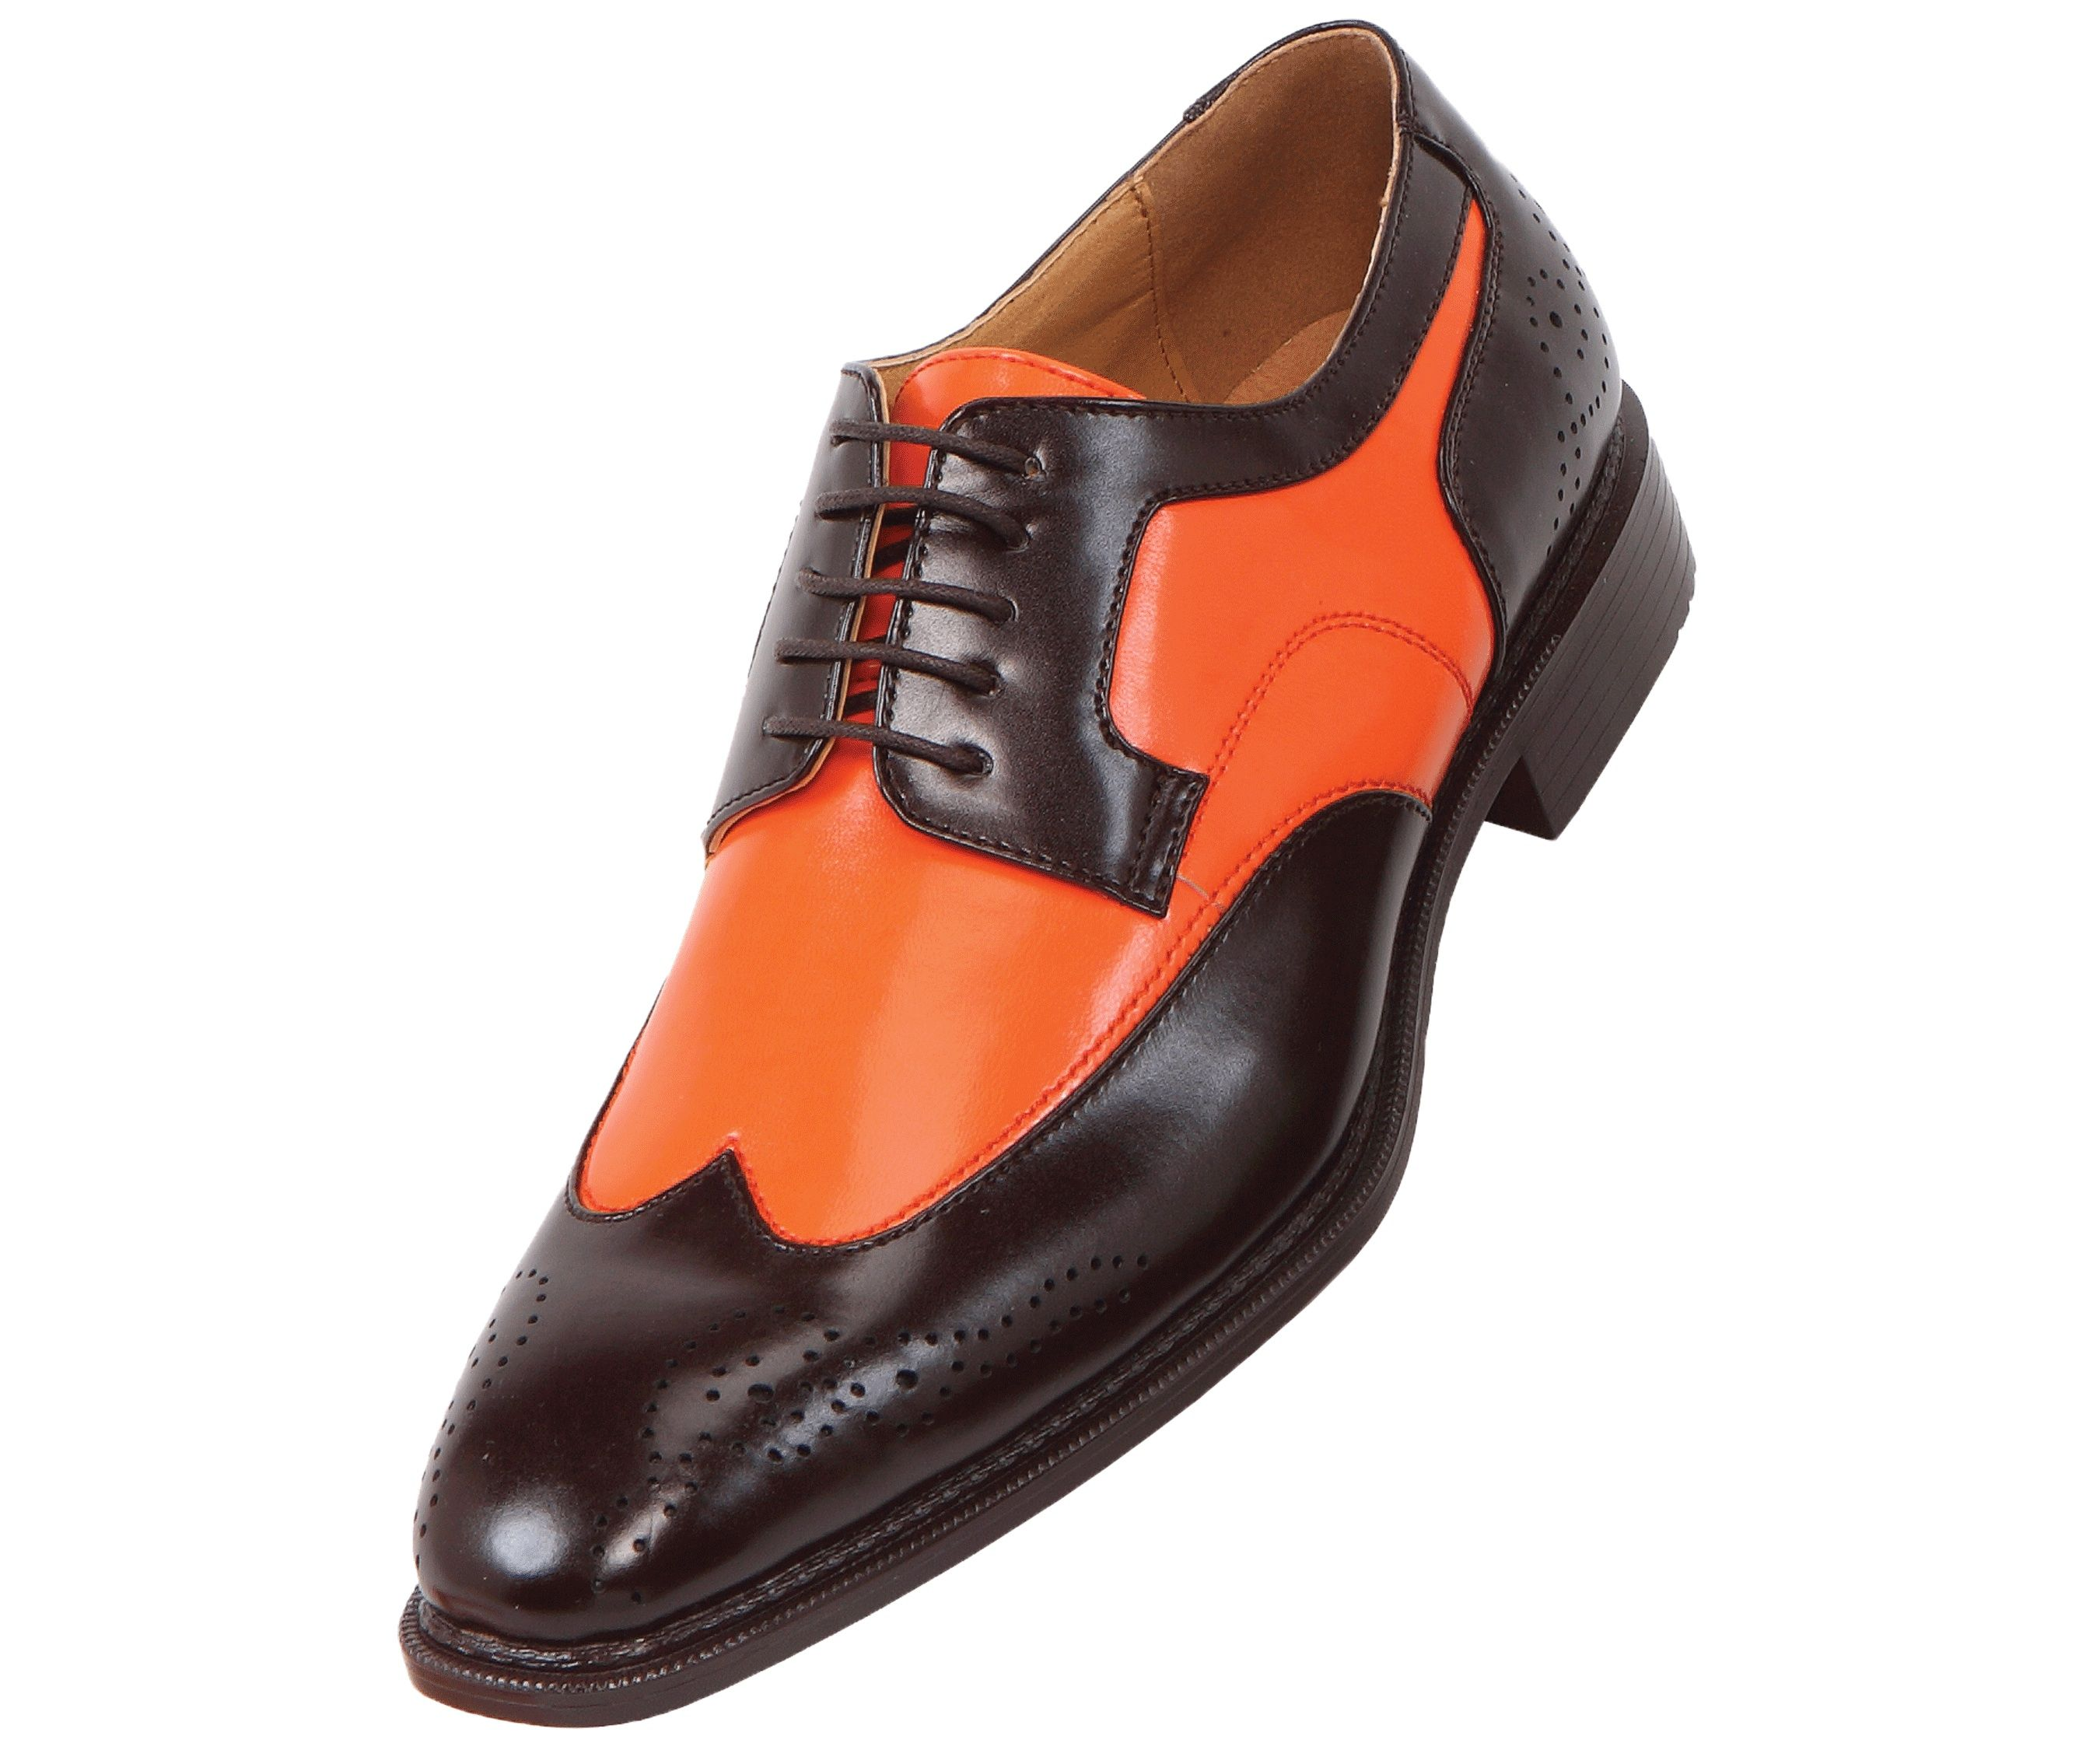 Mens Orange Dress Shoes | On My Grown Man Shit | Pinterest | Brown ...